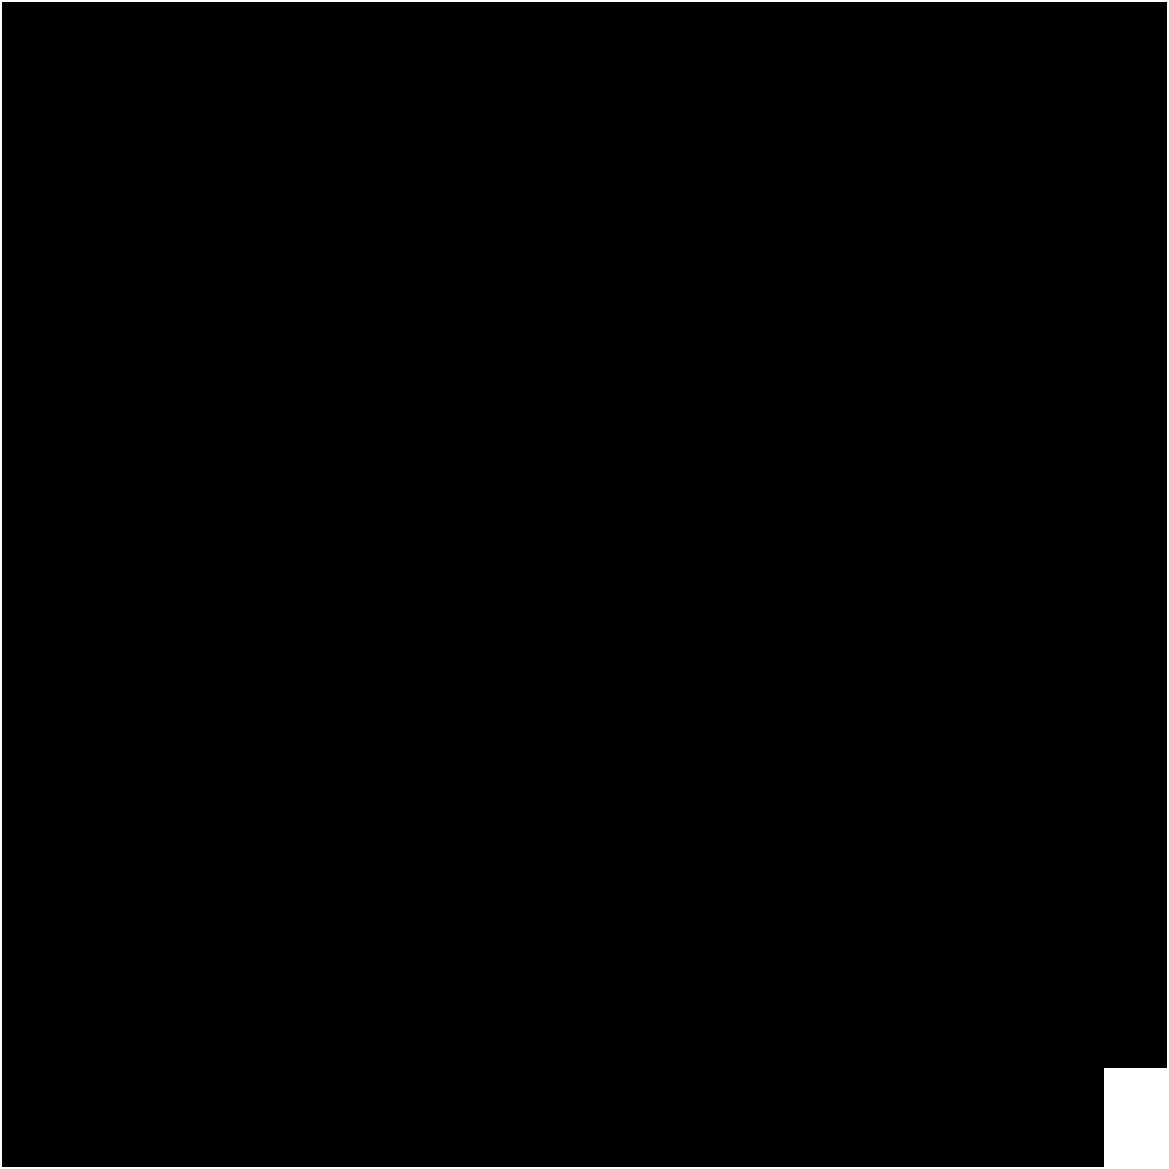 SAMURAI CUT ONLINE